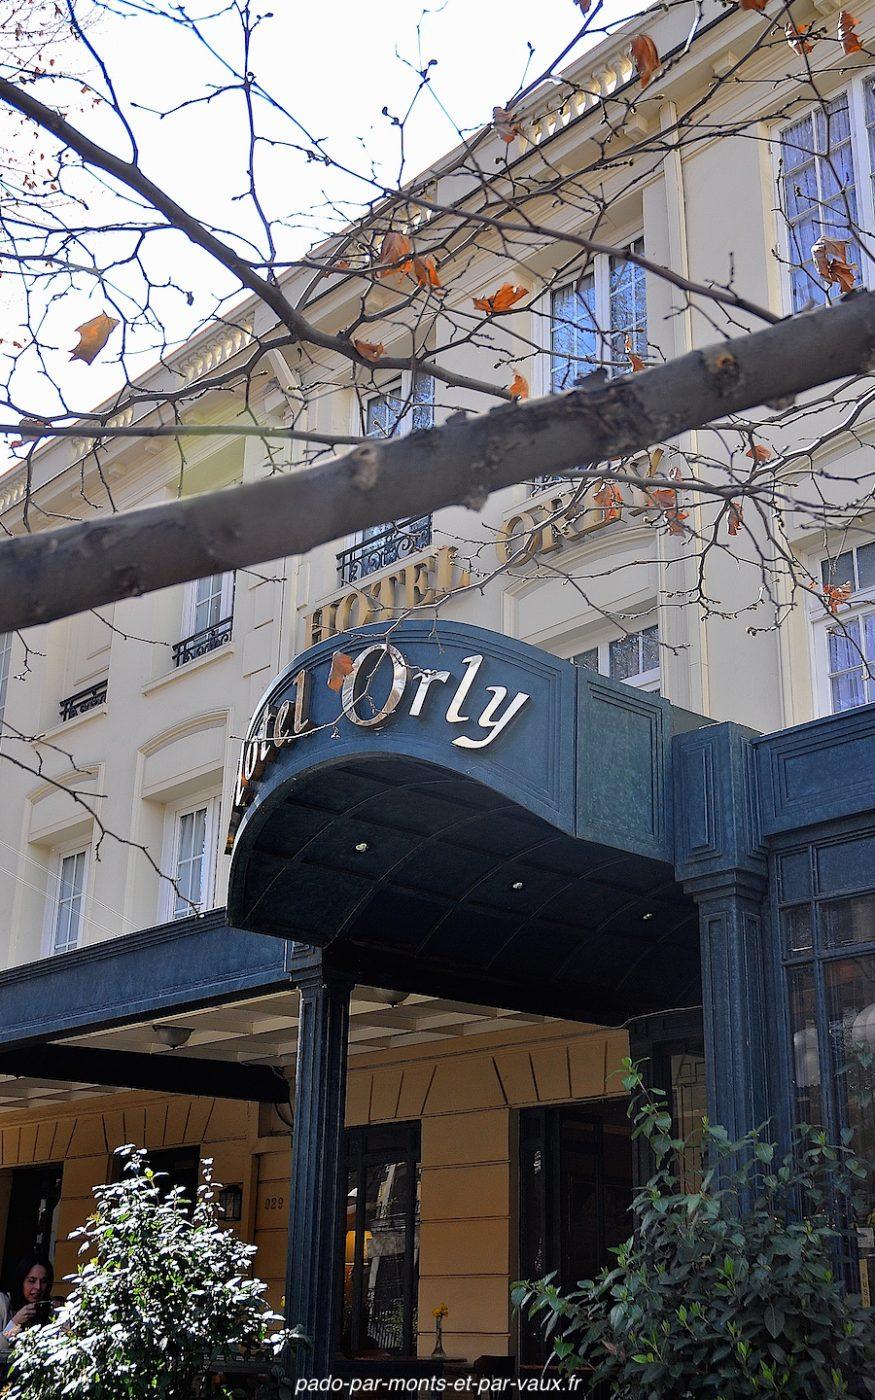 Santiago - Hôtel Orly